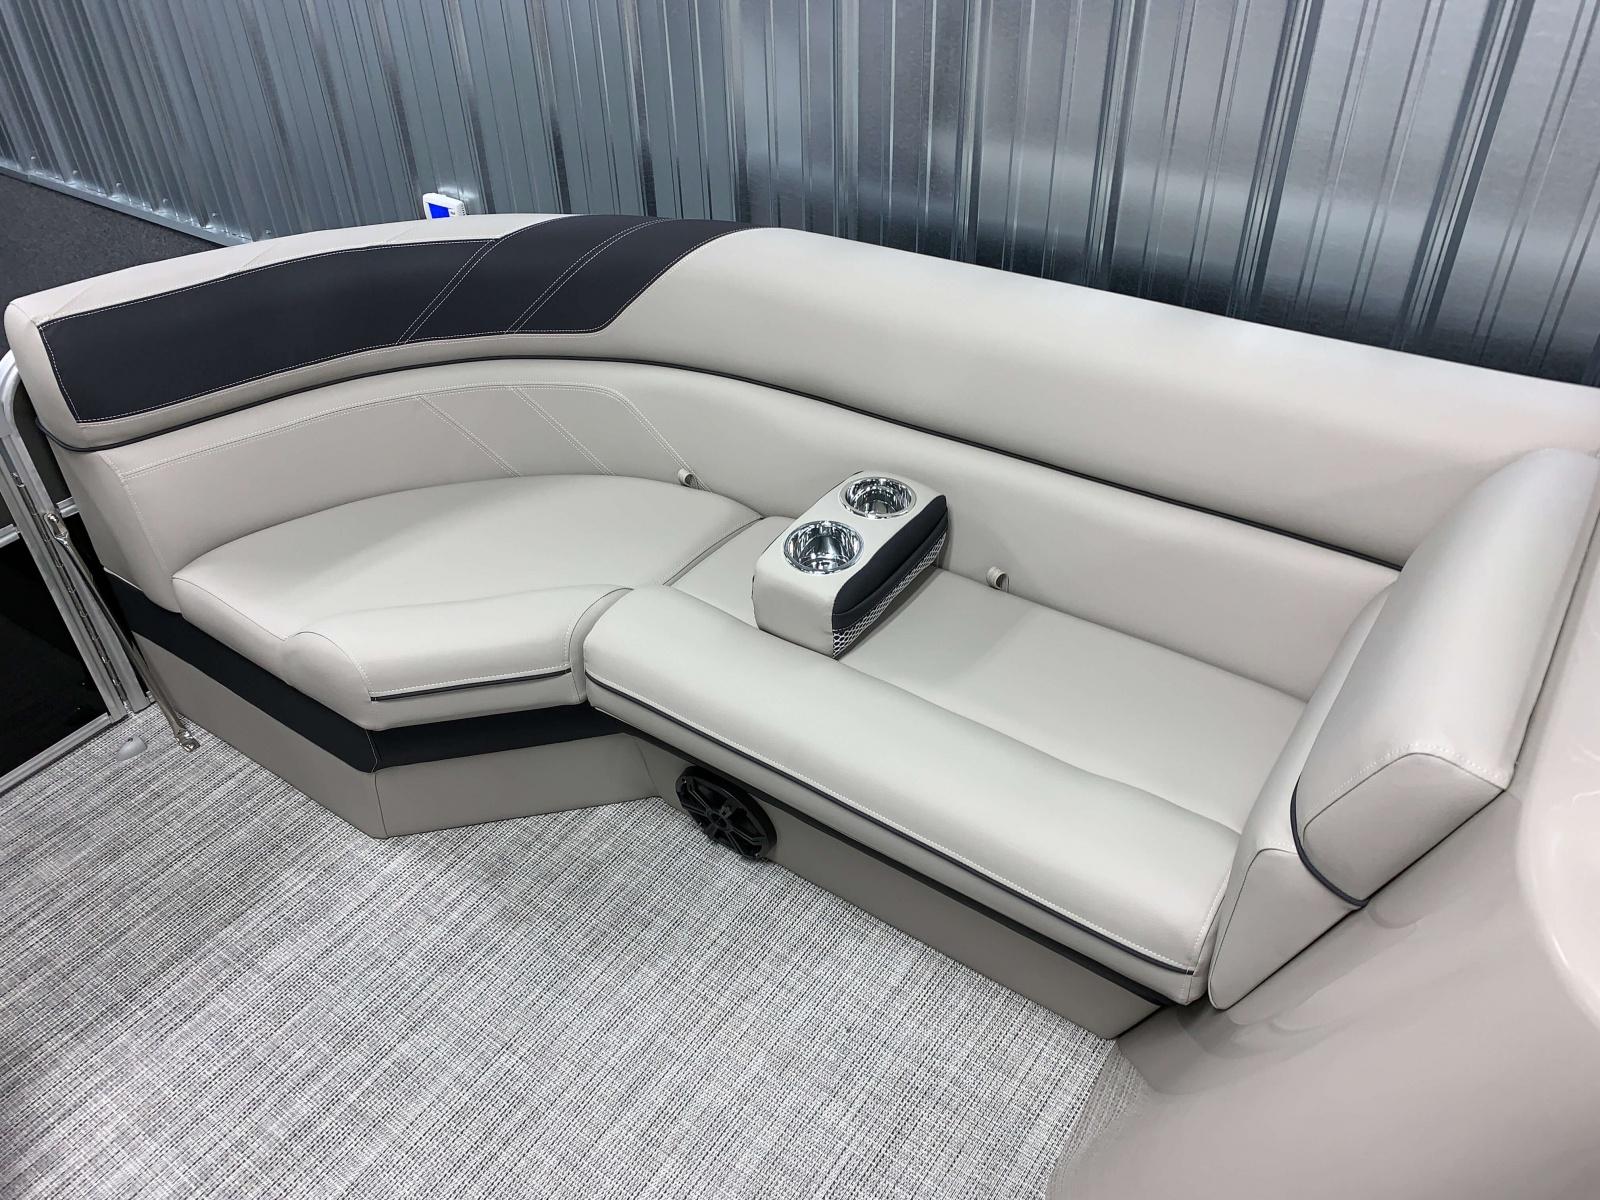 2020-Berkshire-24RFX-LE-Interior-Seating-Layout-6